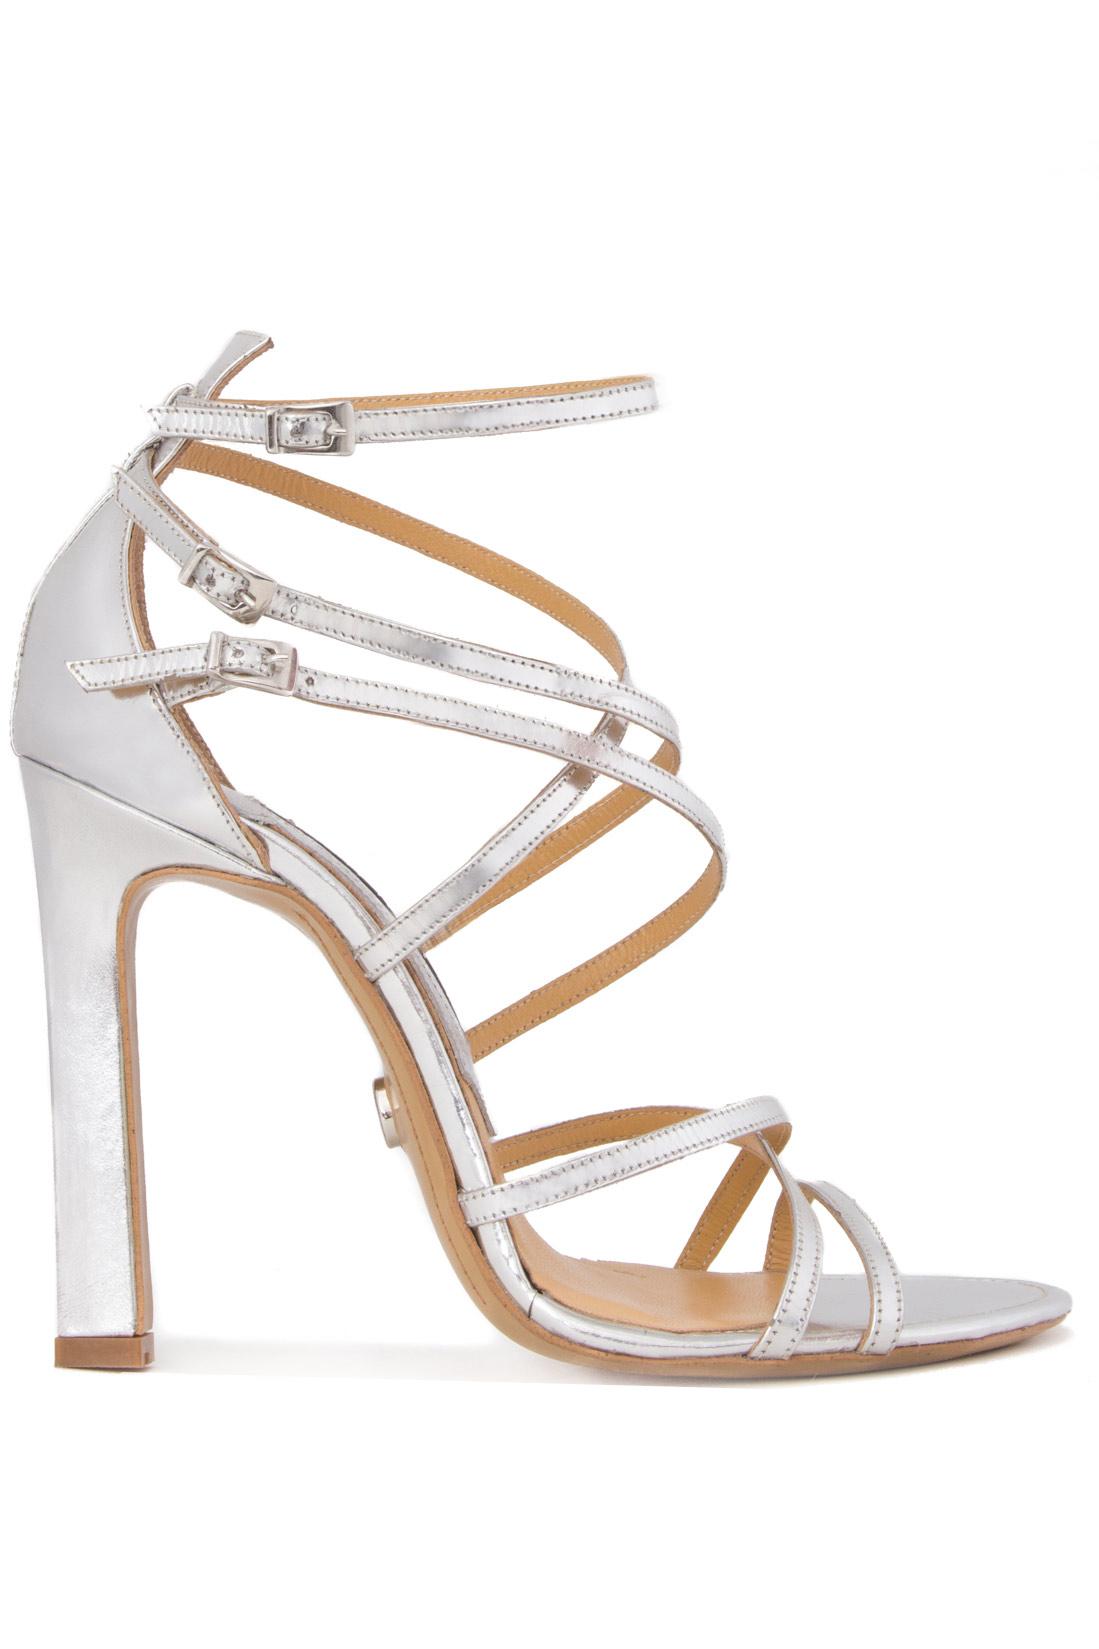 Sandale din piele metalizata Mihai Albu imagine 0